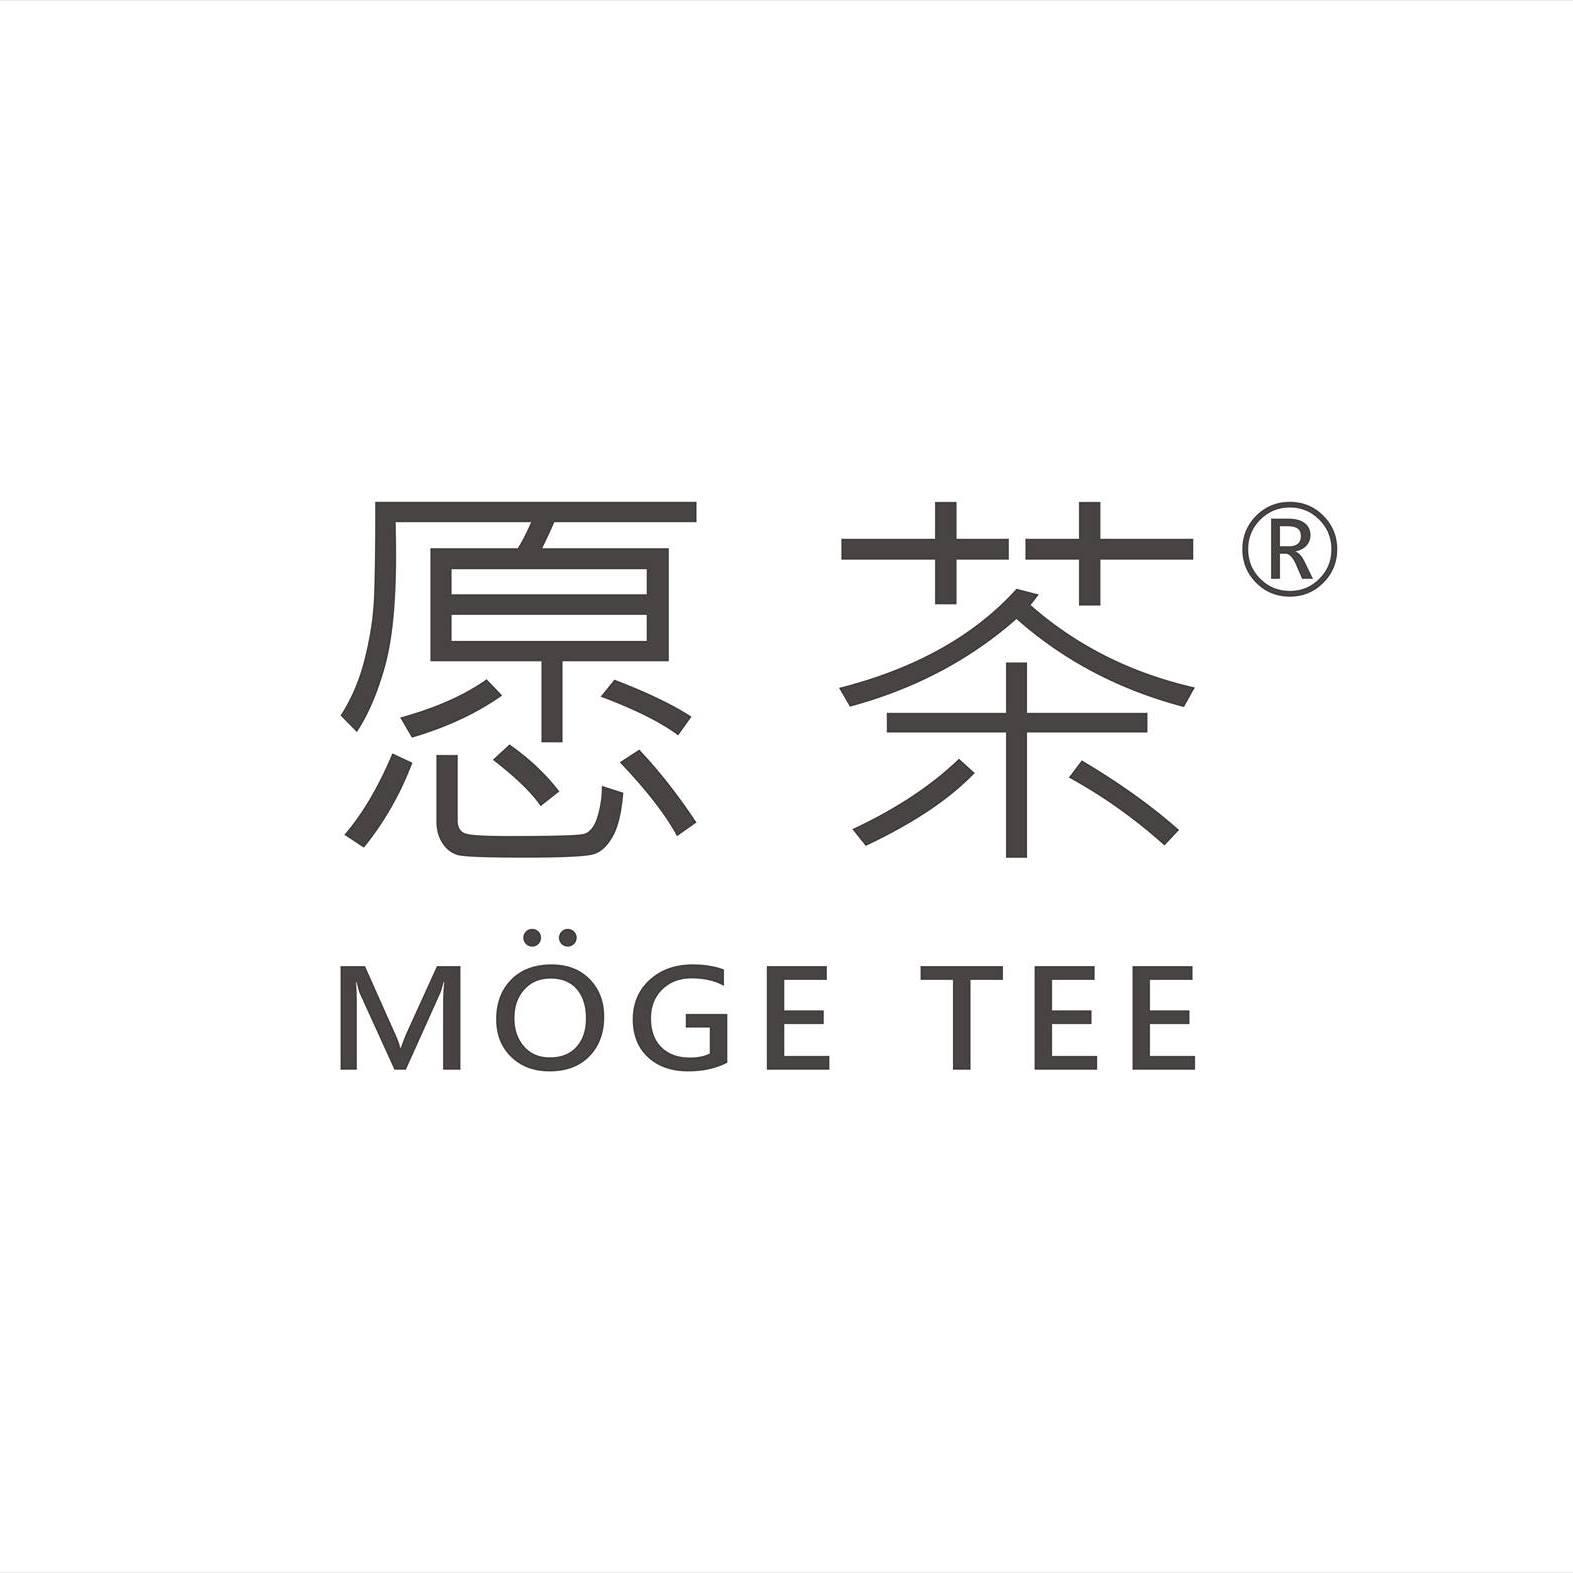 Moge Tee logo